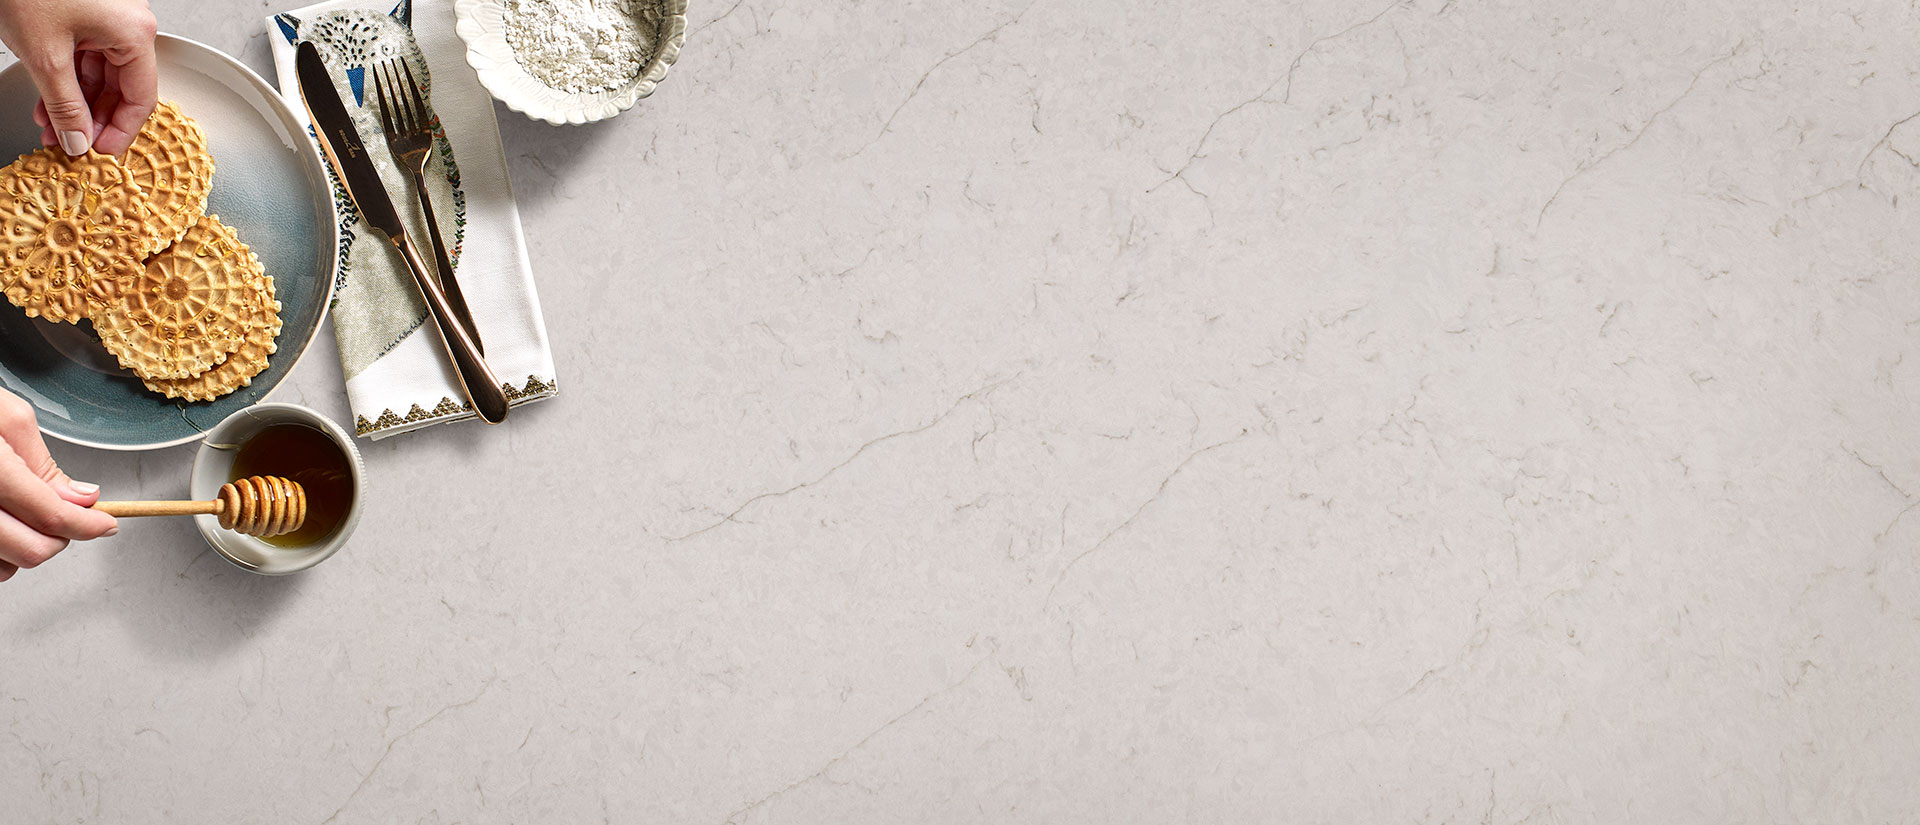 Carrara Caldia Quartz Countertops Vignette